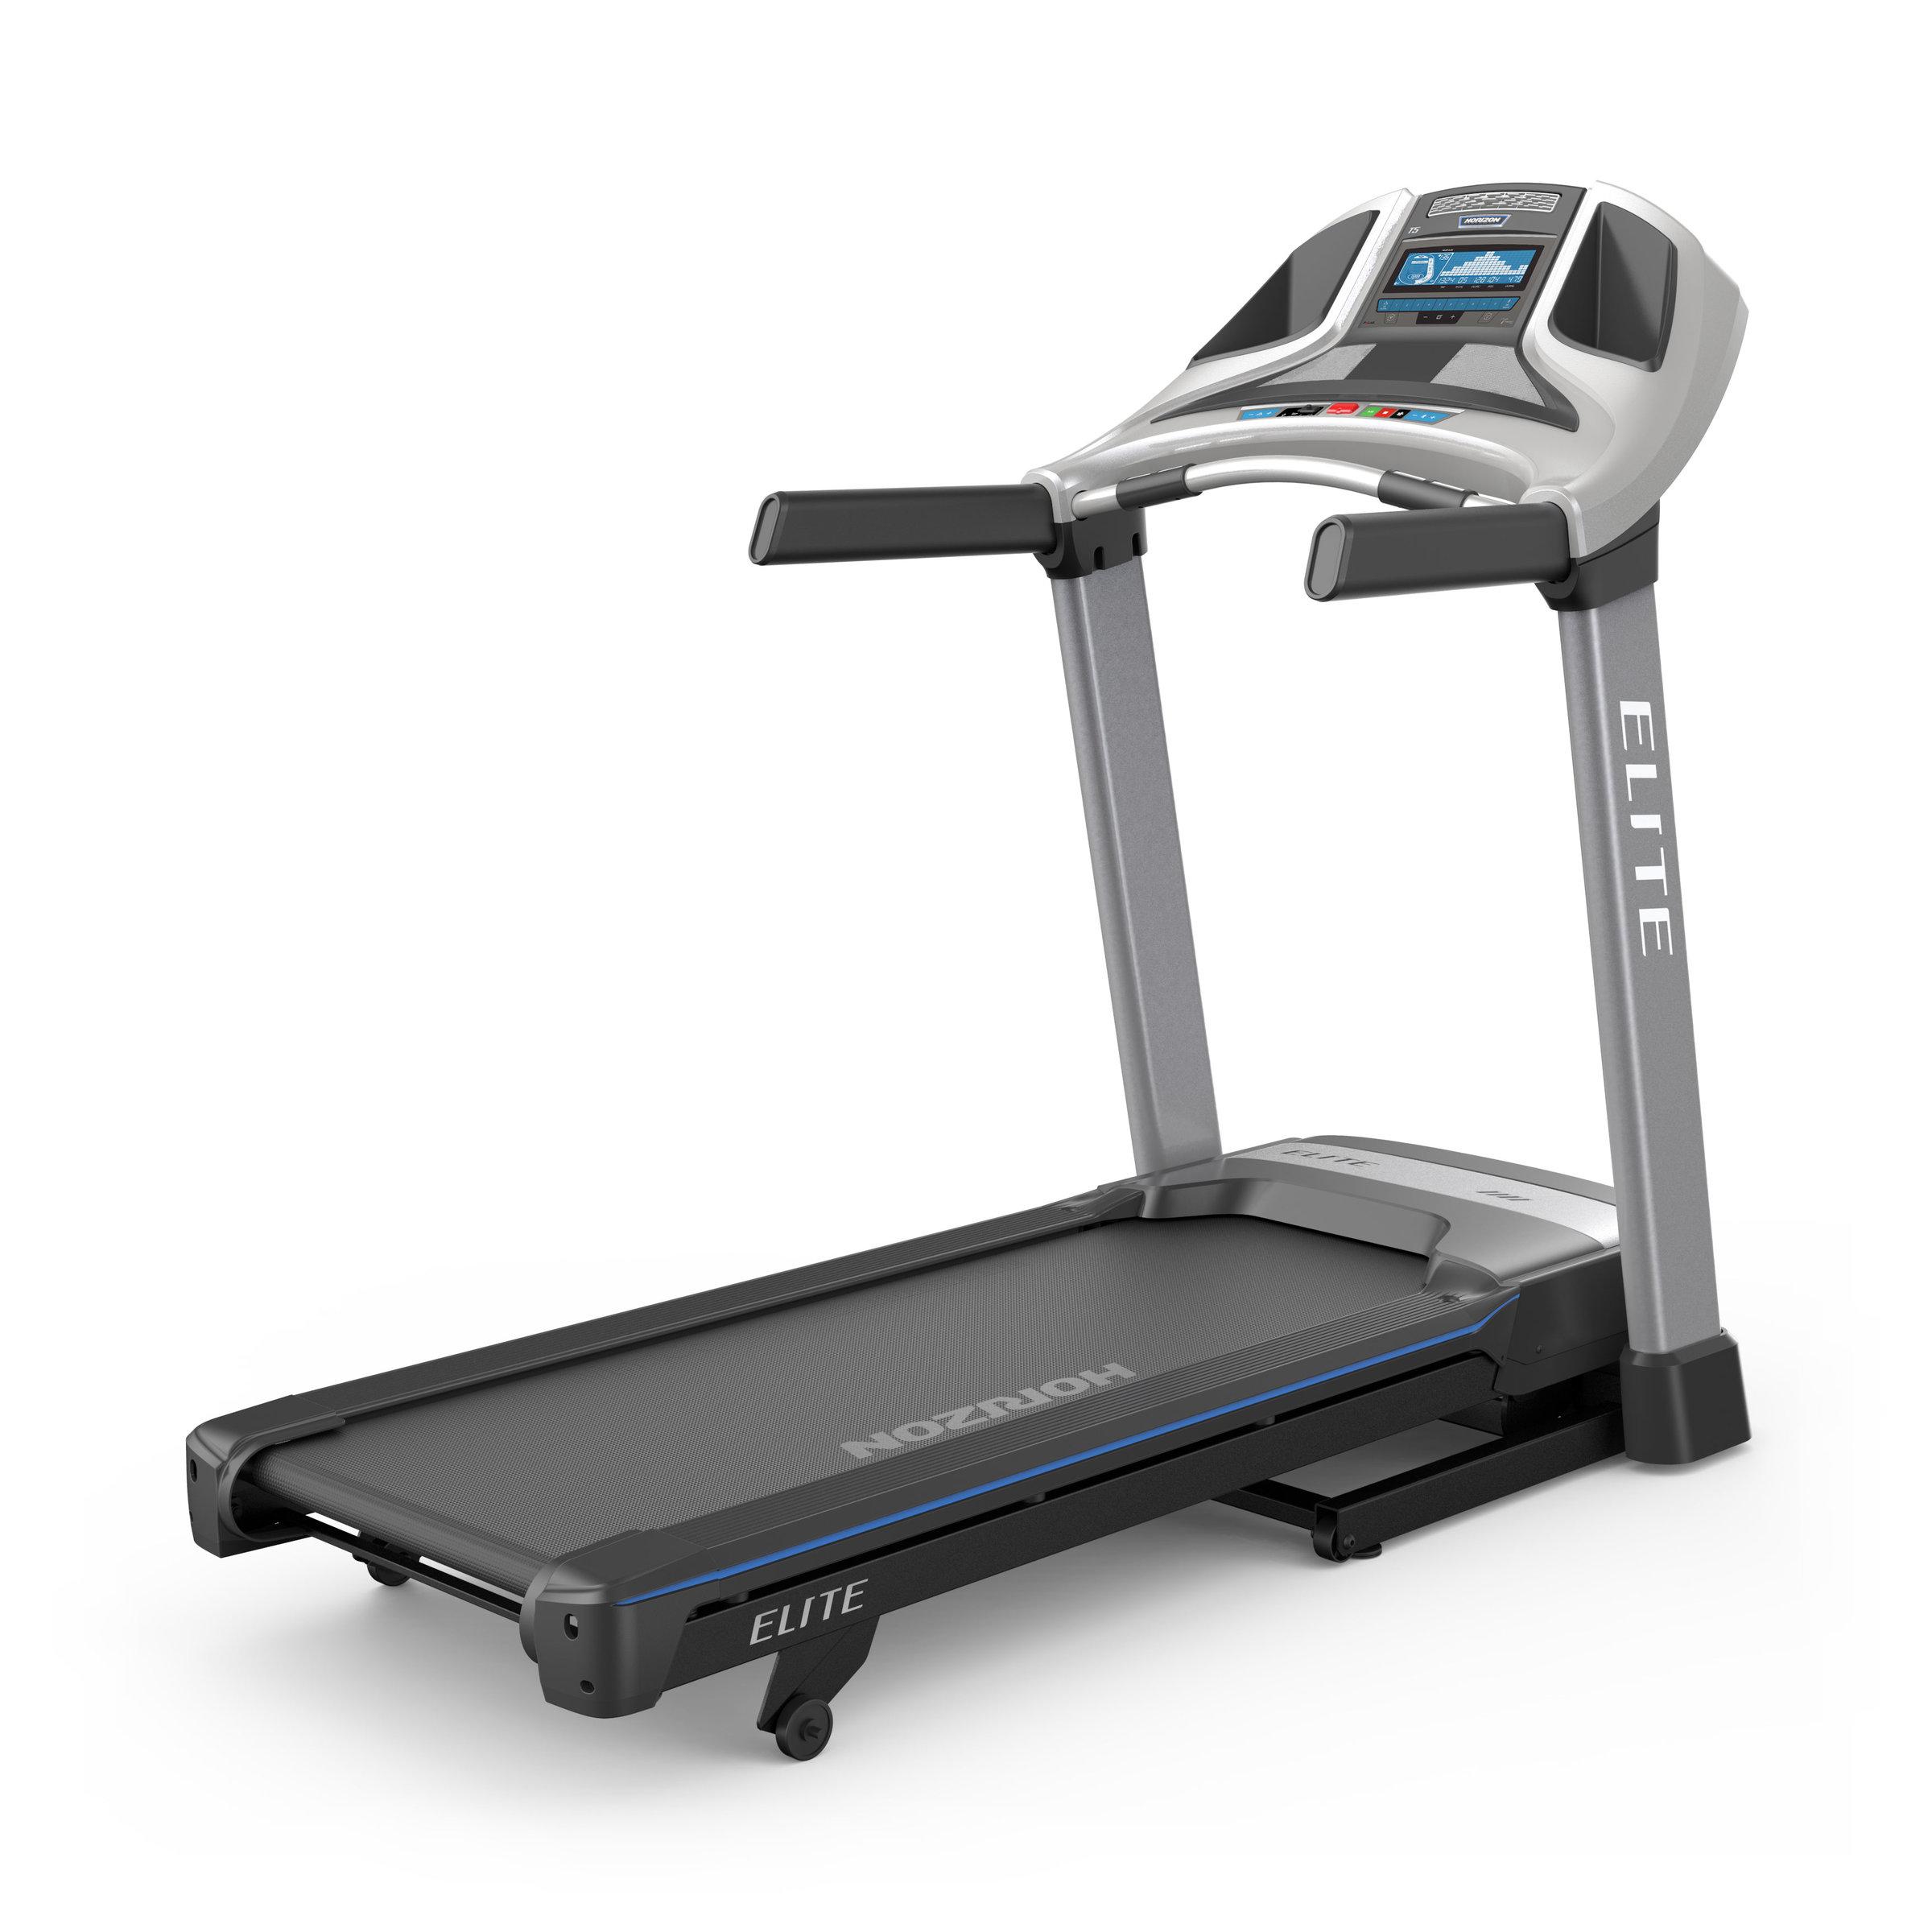 Elite T5 Folding Treadmill With ViaFit